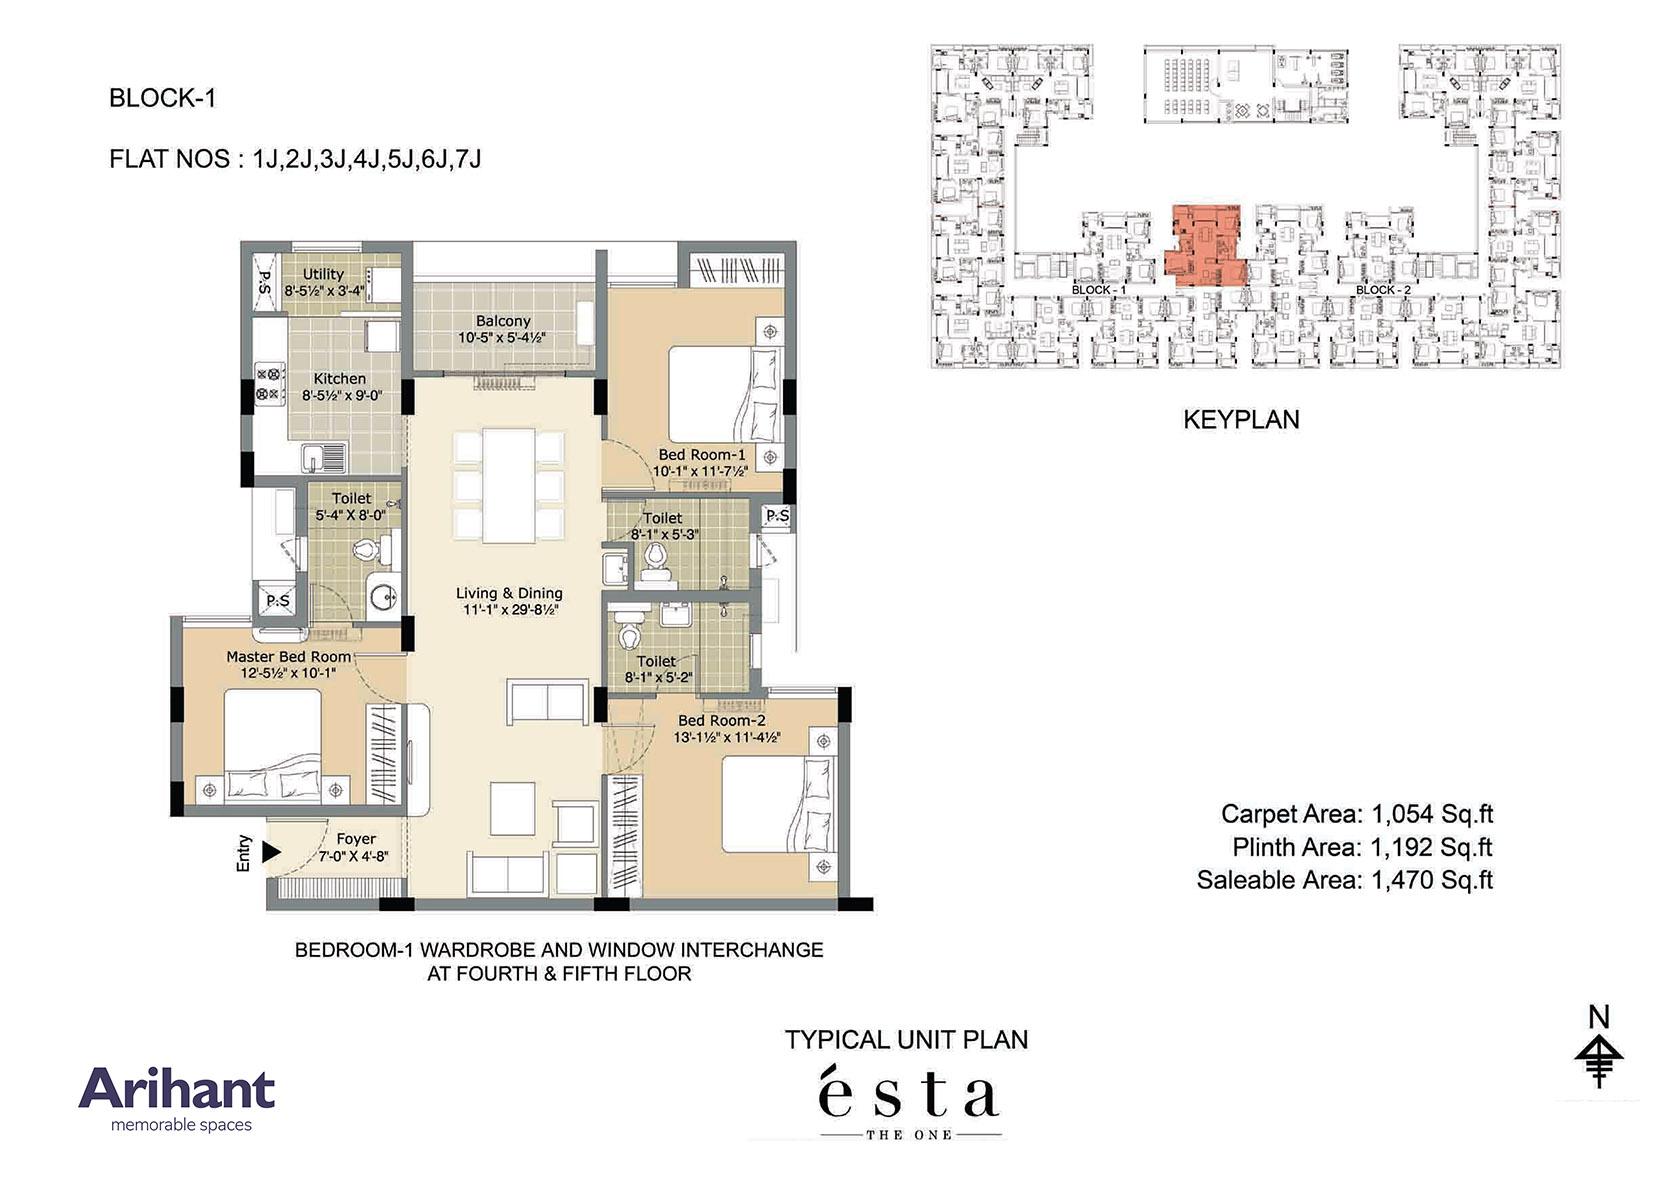 Arihant - Esta_Typical Unit Plan - Block 1 - Type J